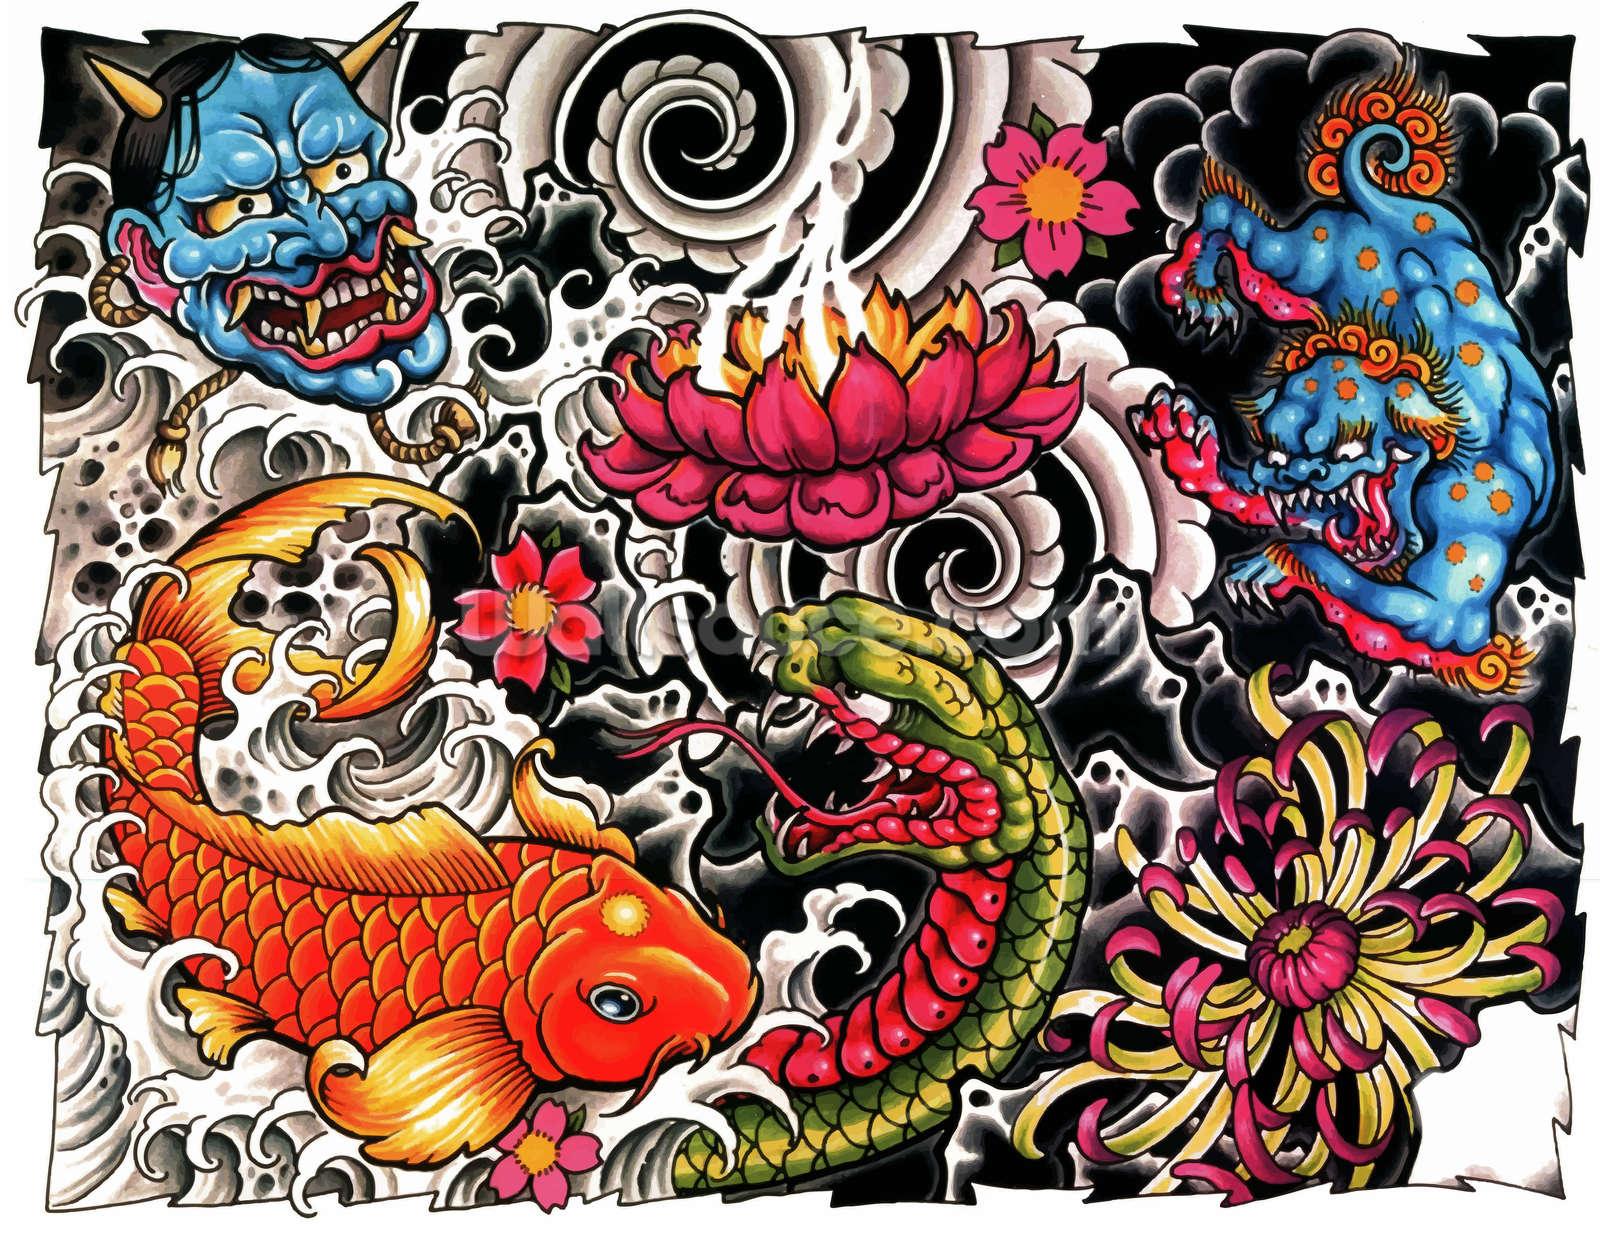 murals wallpaper us